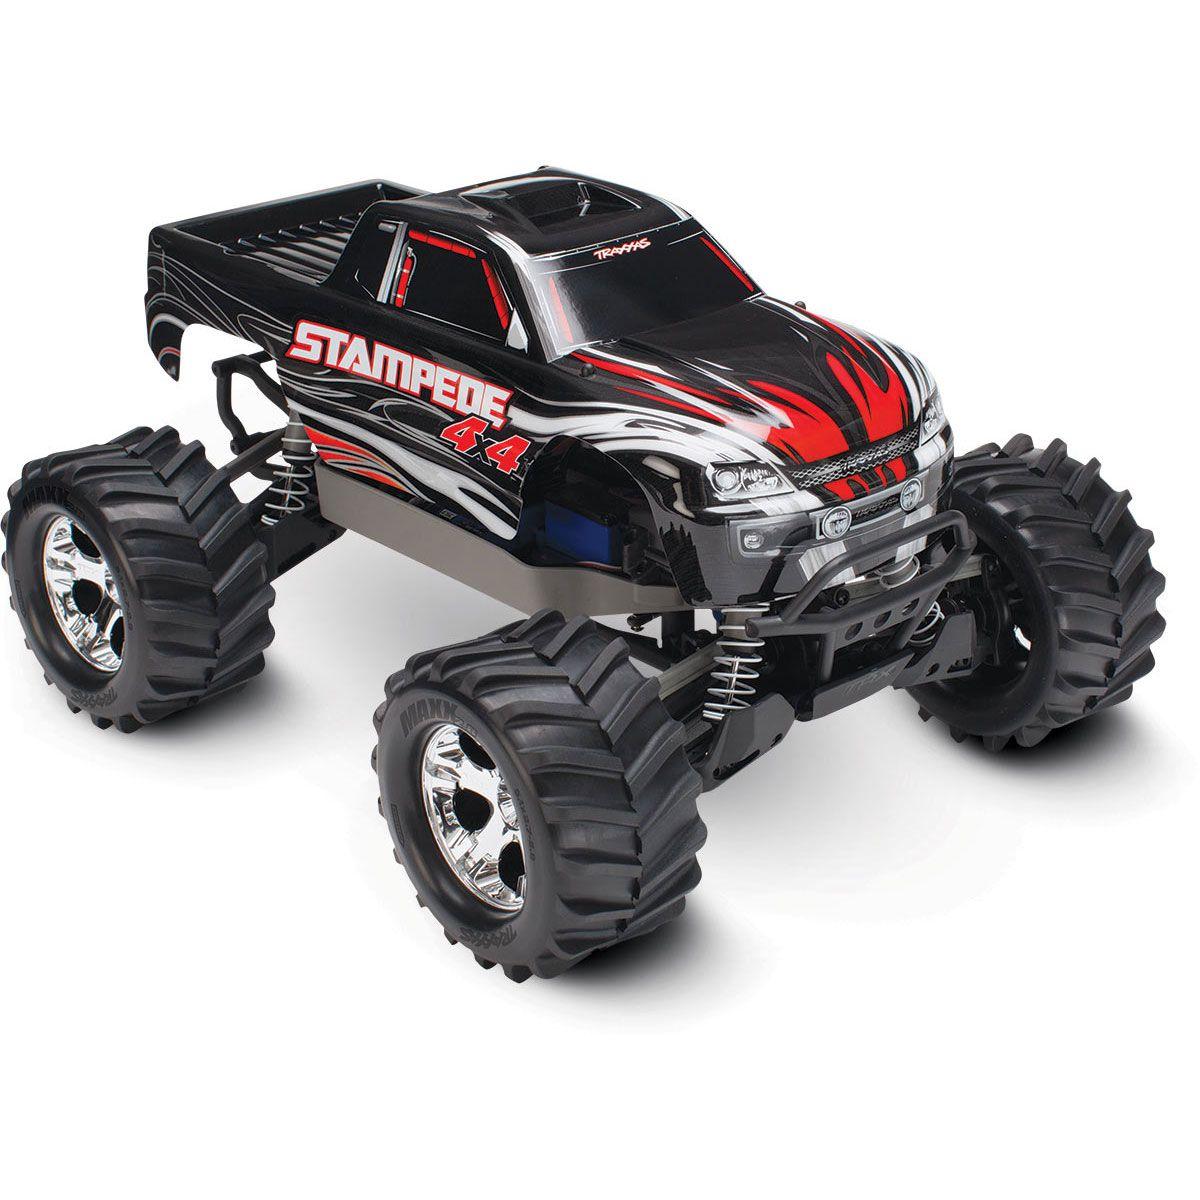 traxxas stampede 4x4 ready to run xl 5 remote control monster truck rh horizonhobby com traxxas stampede xl5 manual Traxxas Stampede Bodies